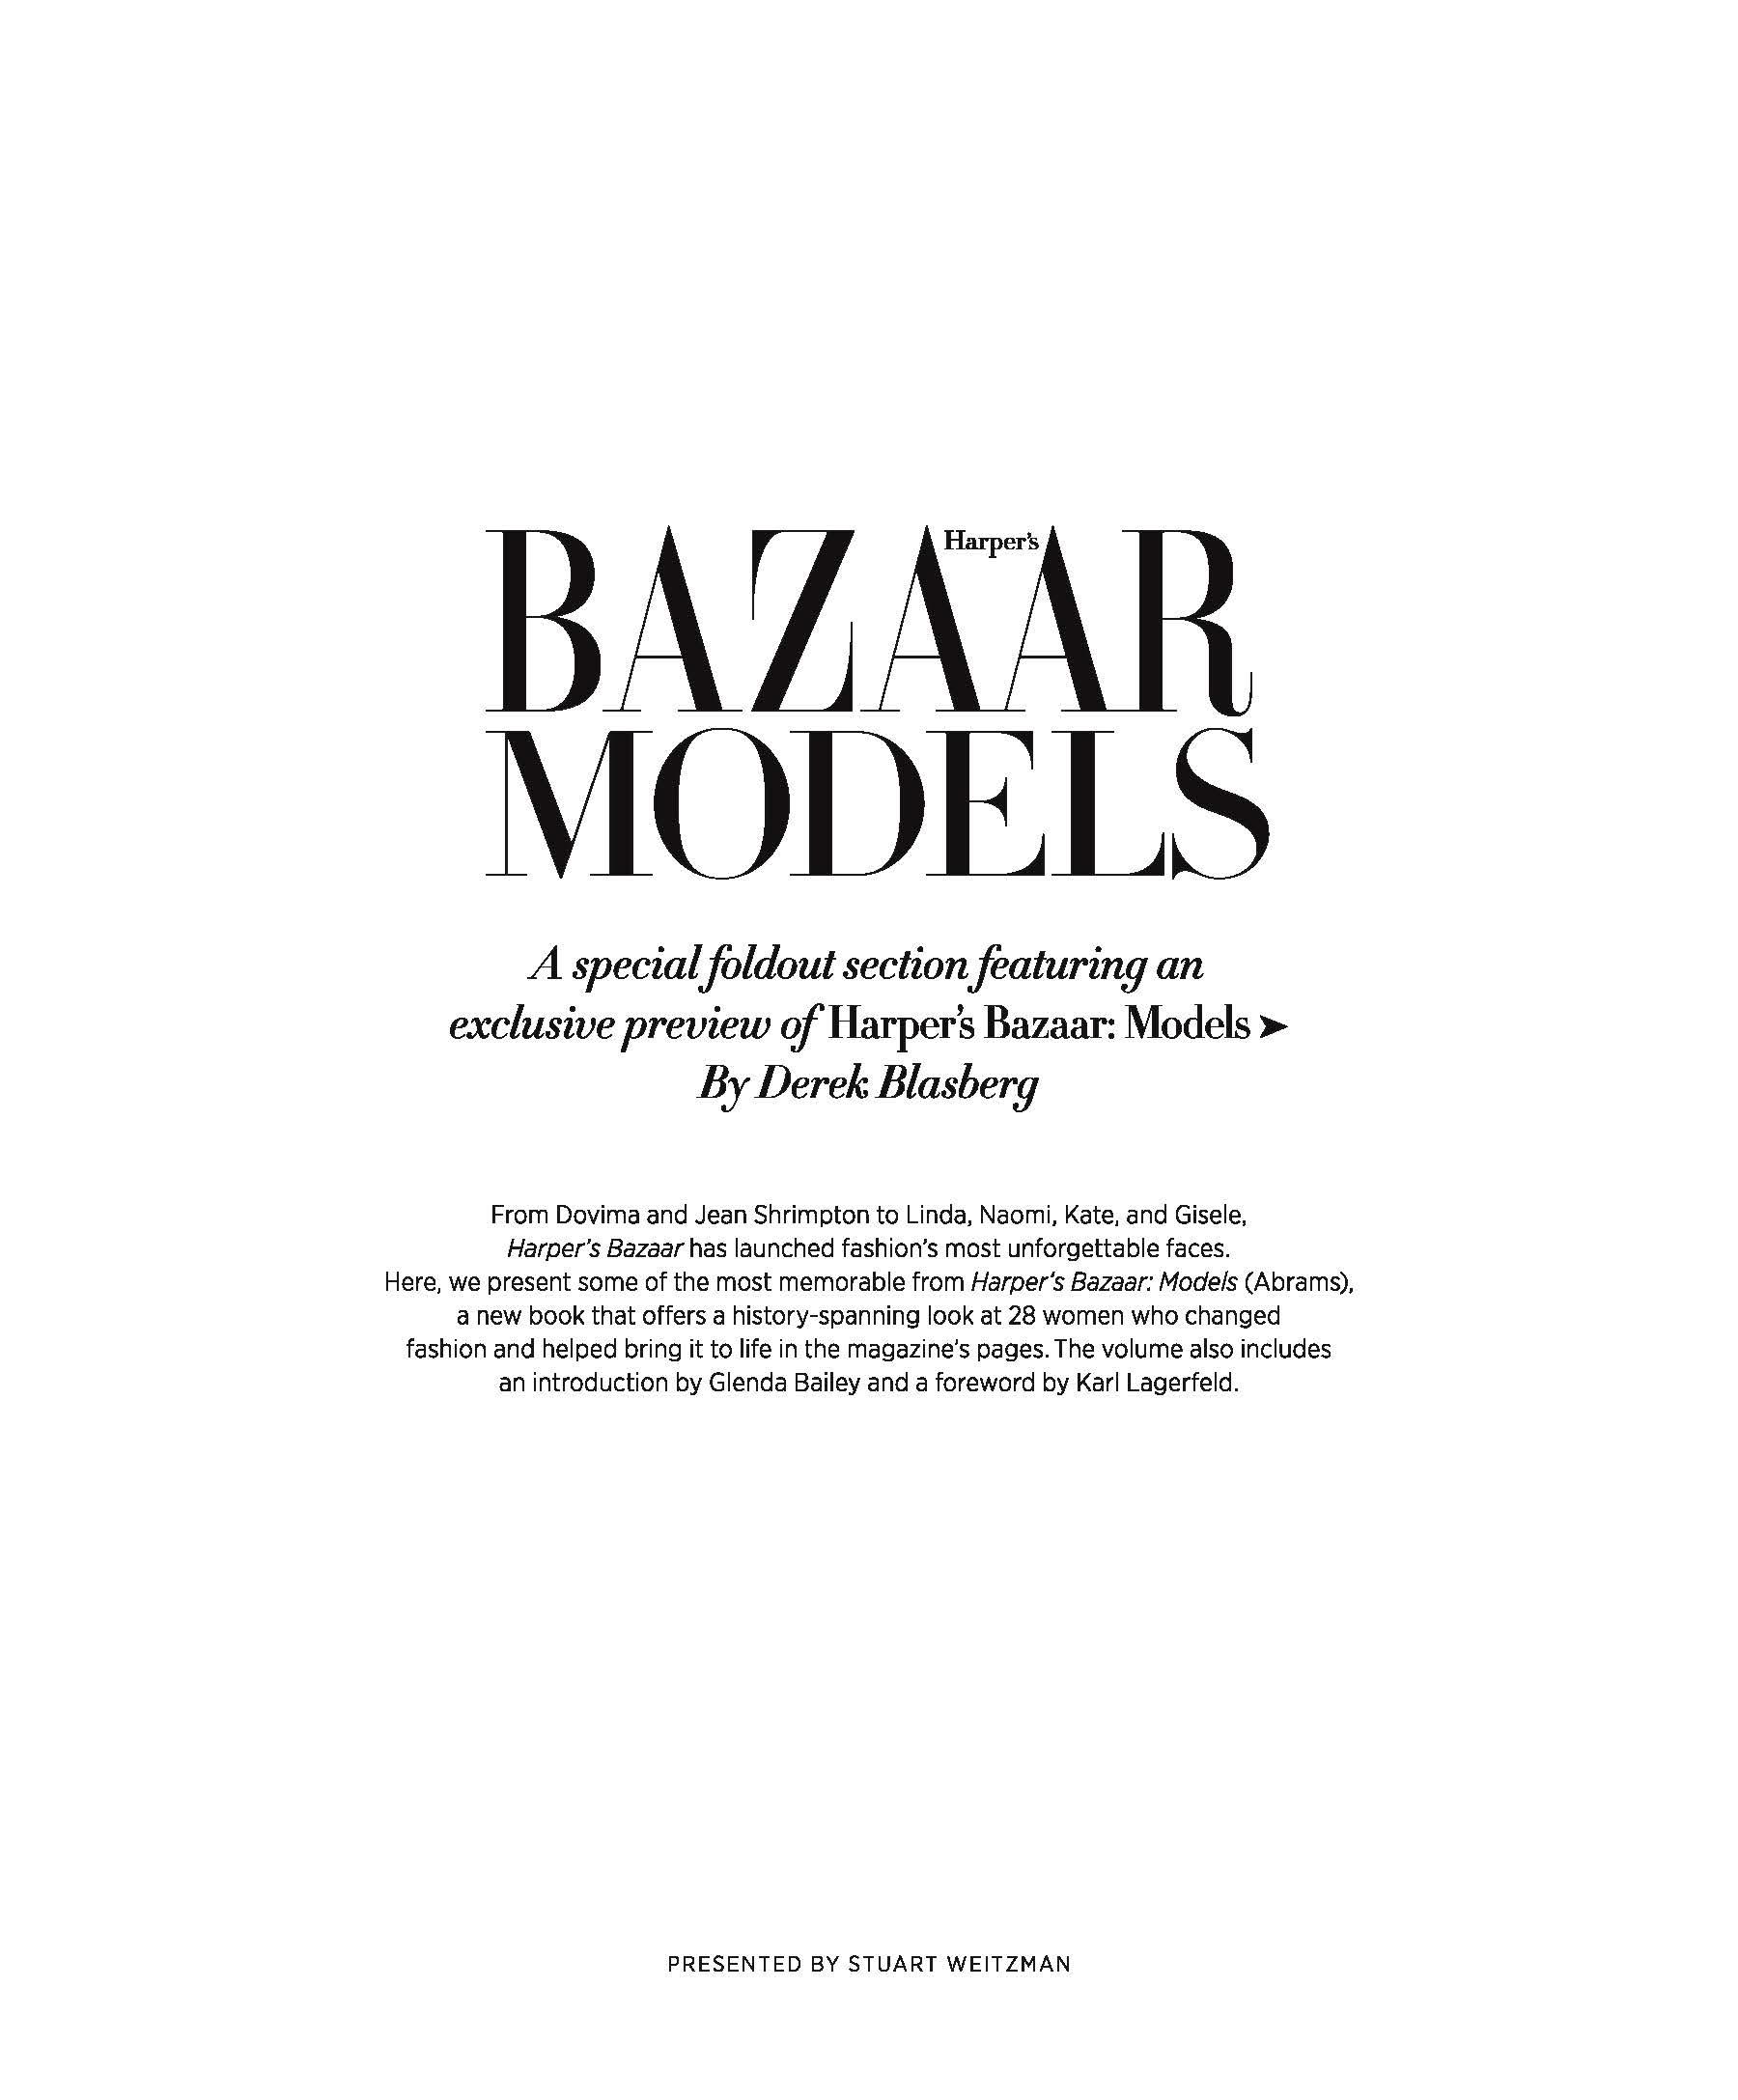 HBZ September Models Excerpt_Page_01.jpg